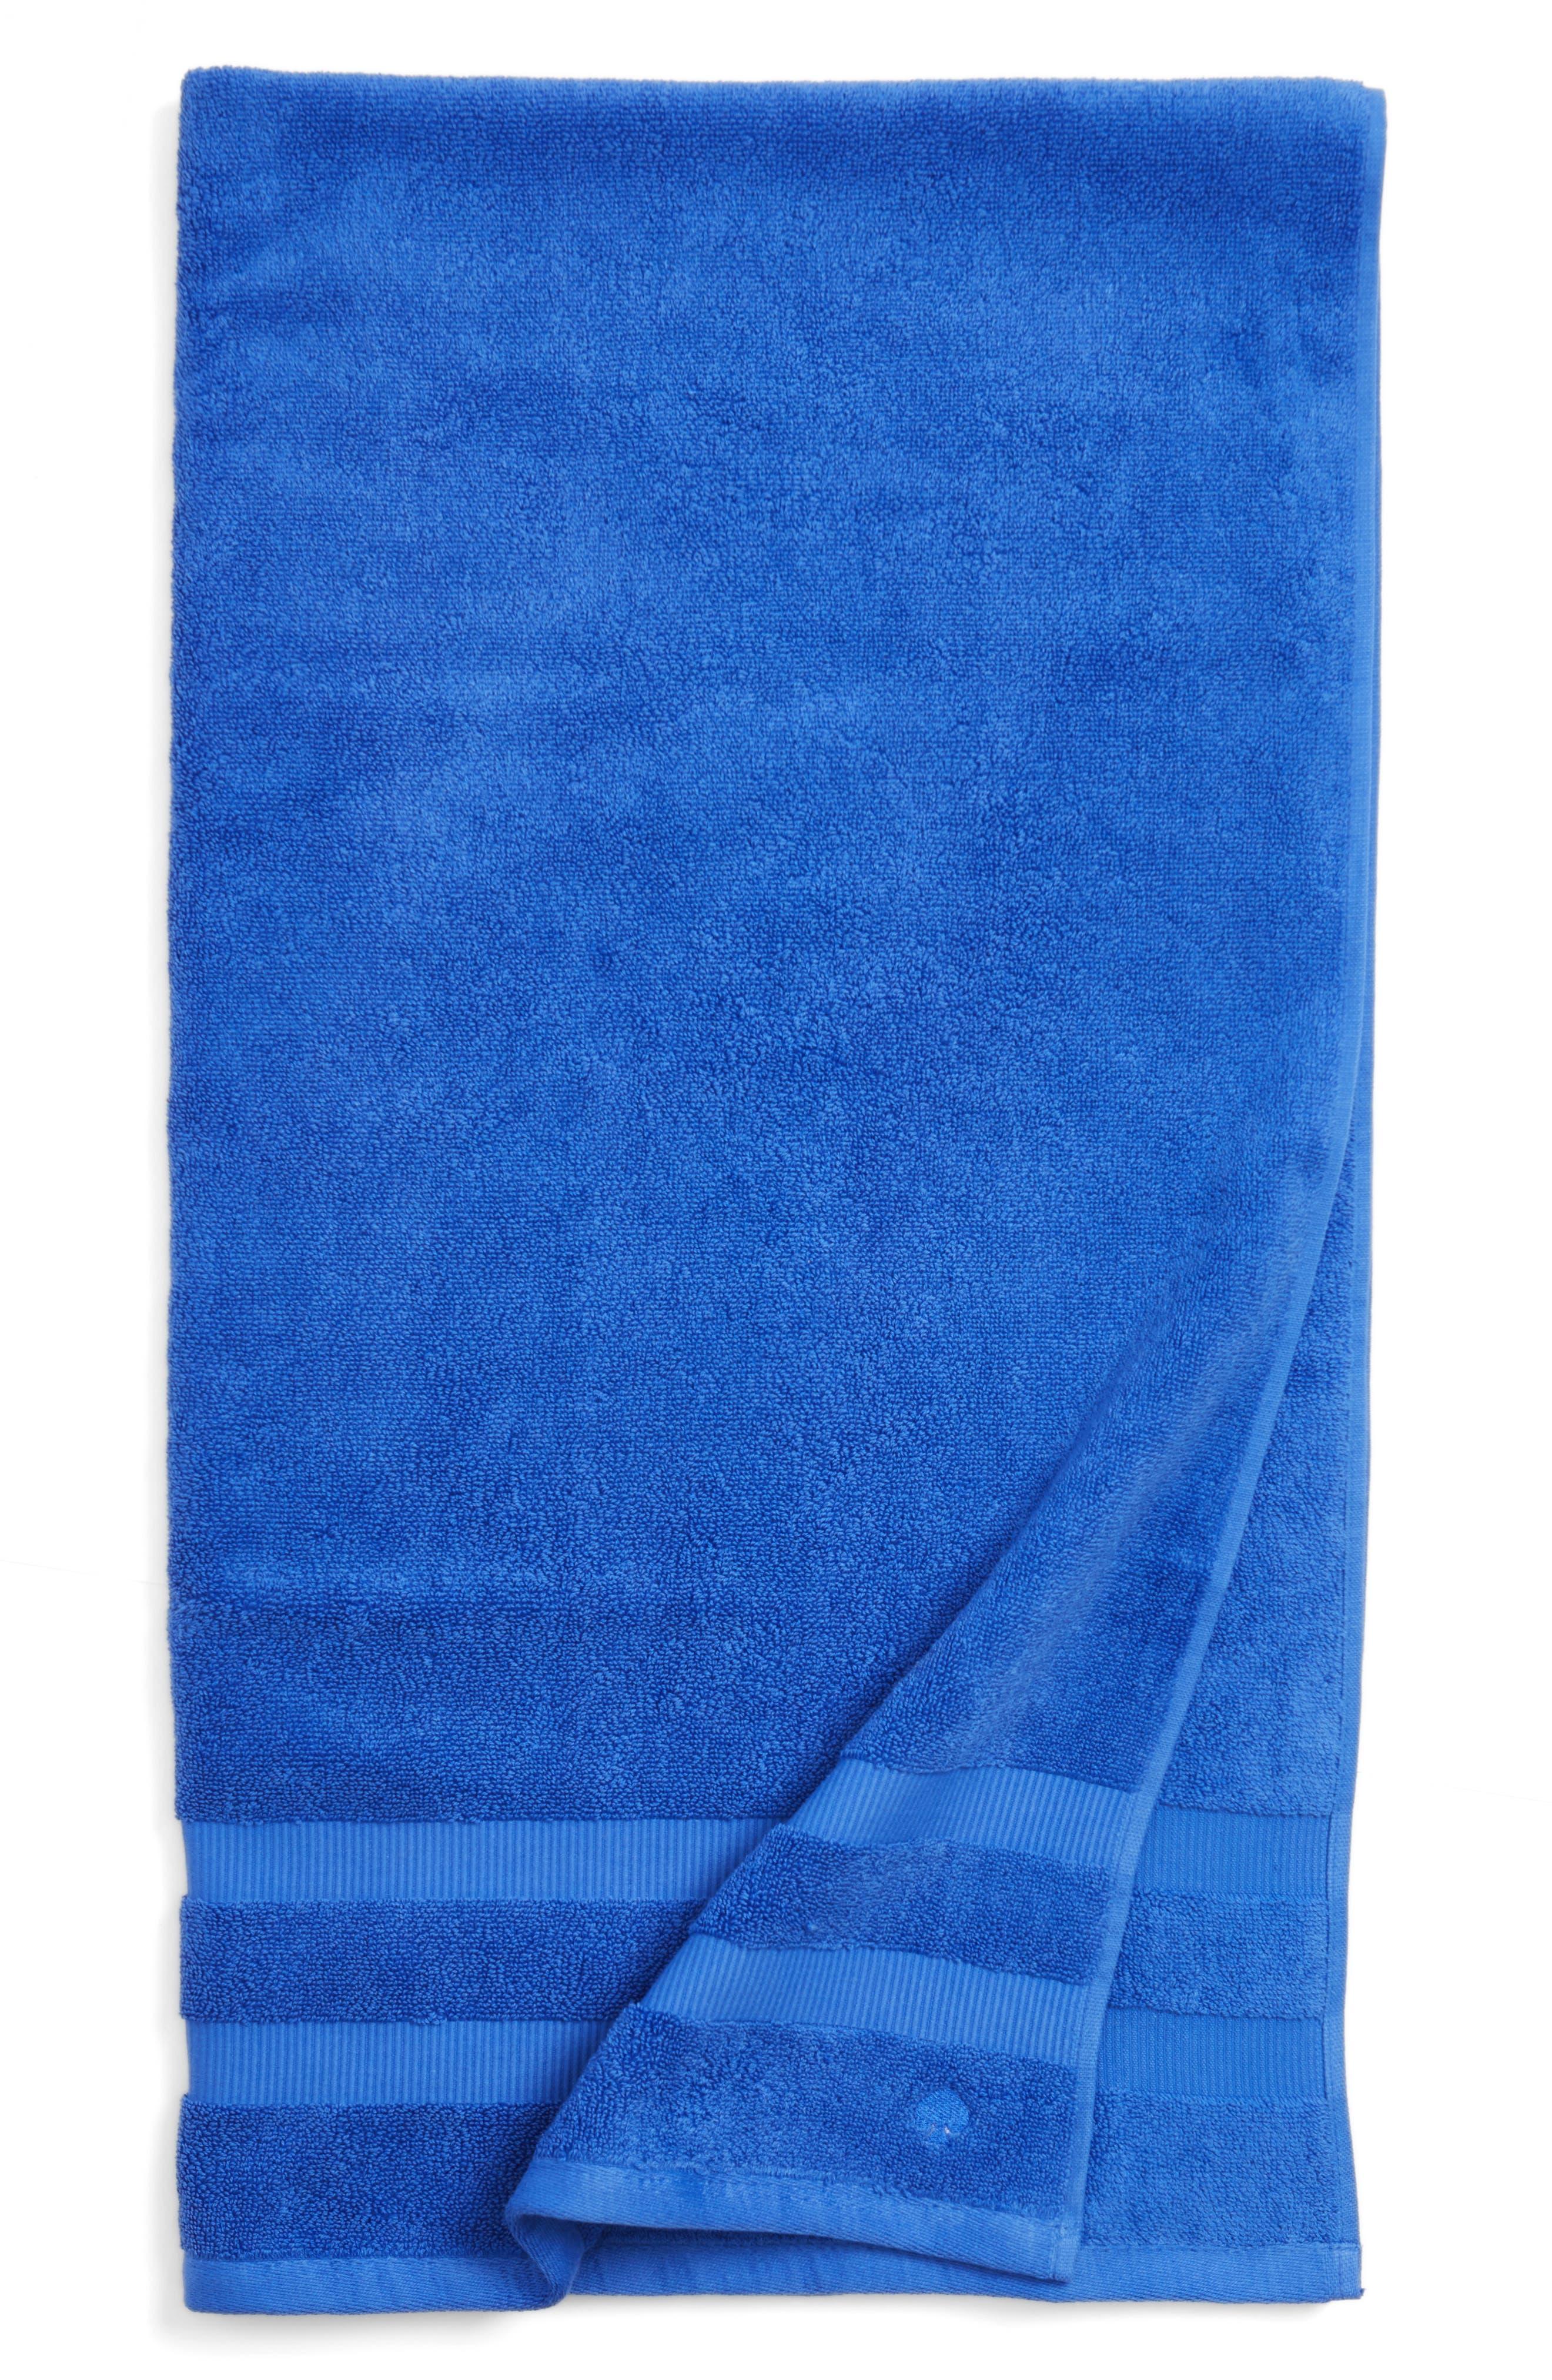 Main Image - kate spade new york 'chattam stripe' bath towel